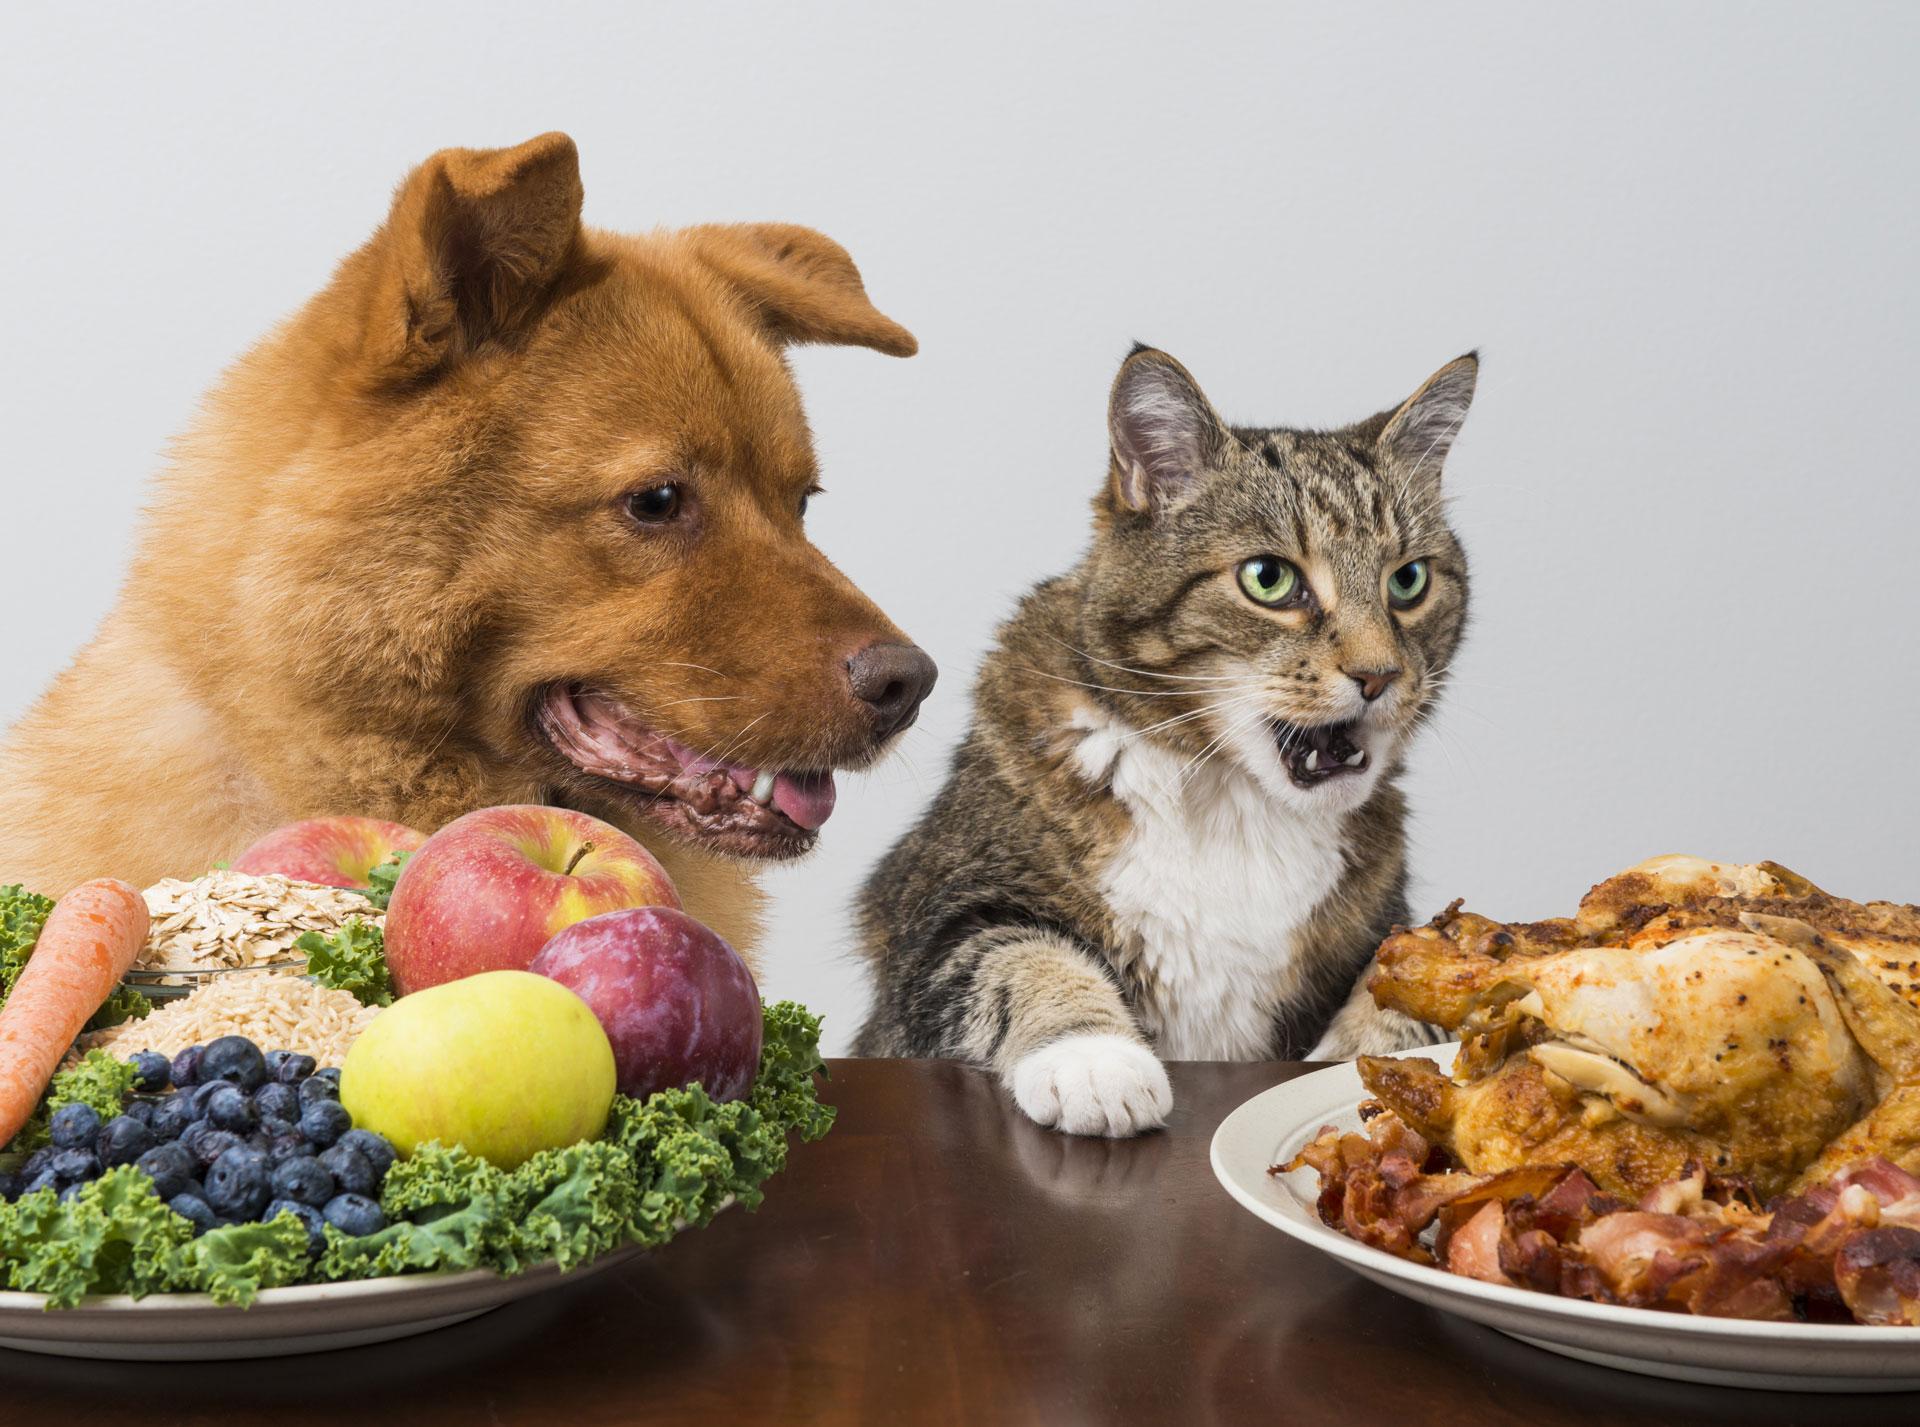 Can technology make vegan pet food a reality? - Verdict